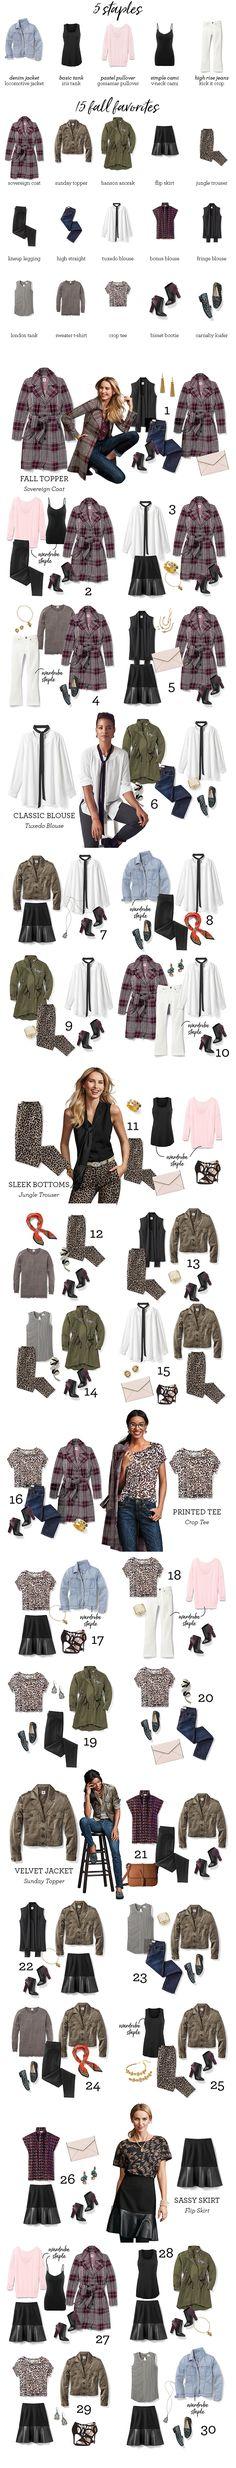 Karen.mcdonald.cabionline.com....Shop 24/7